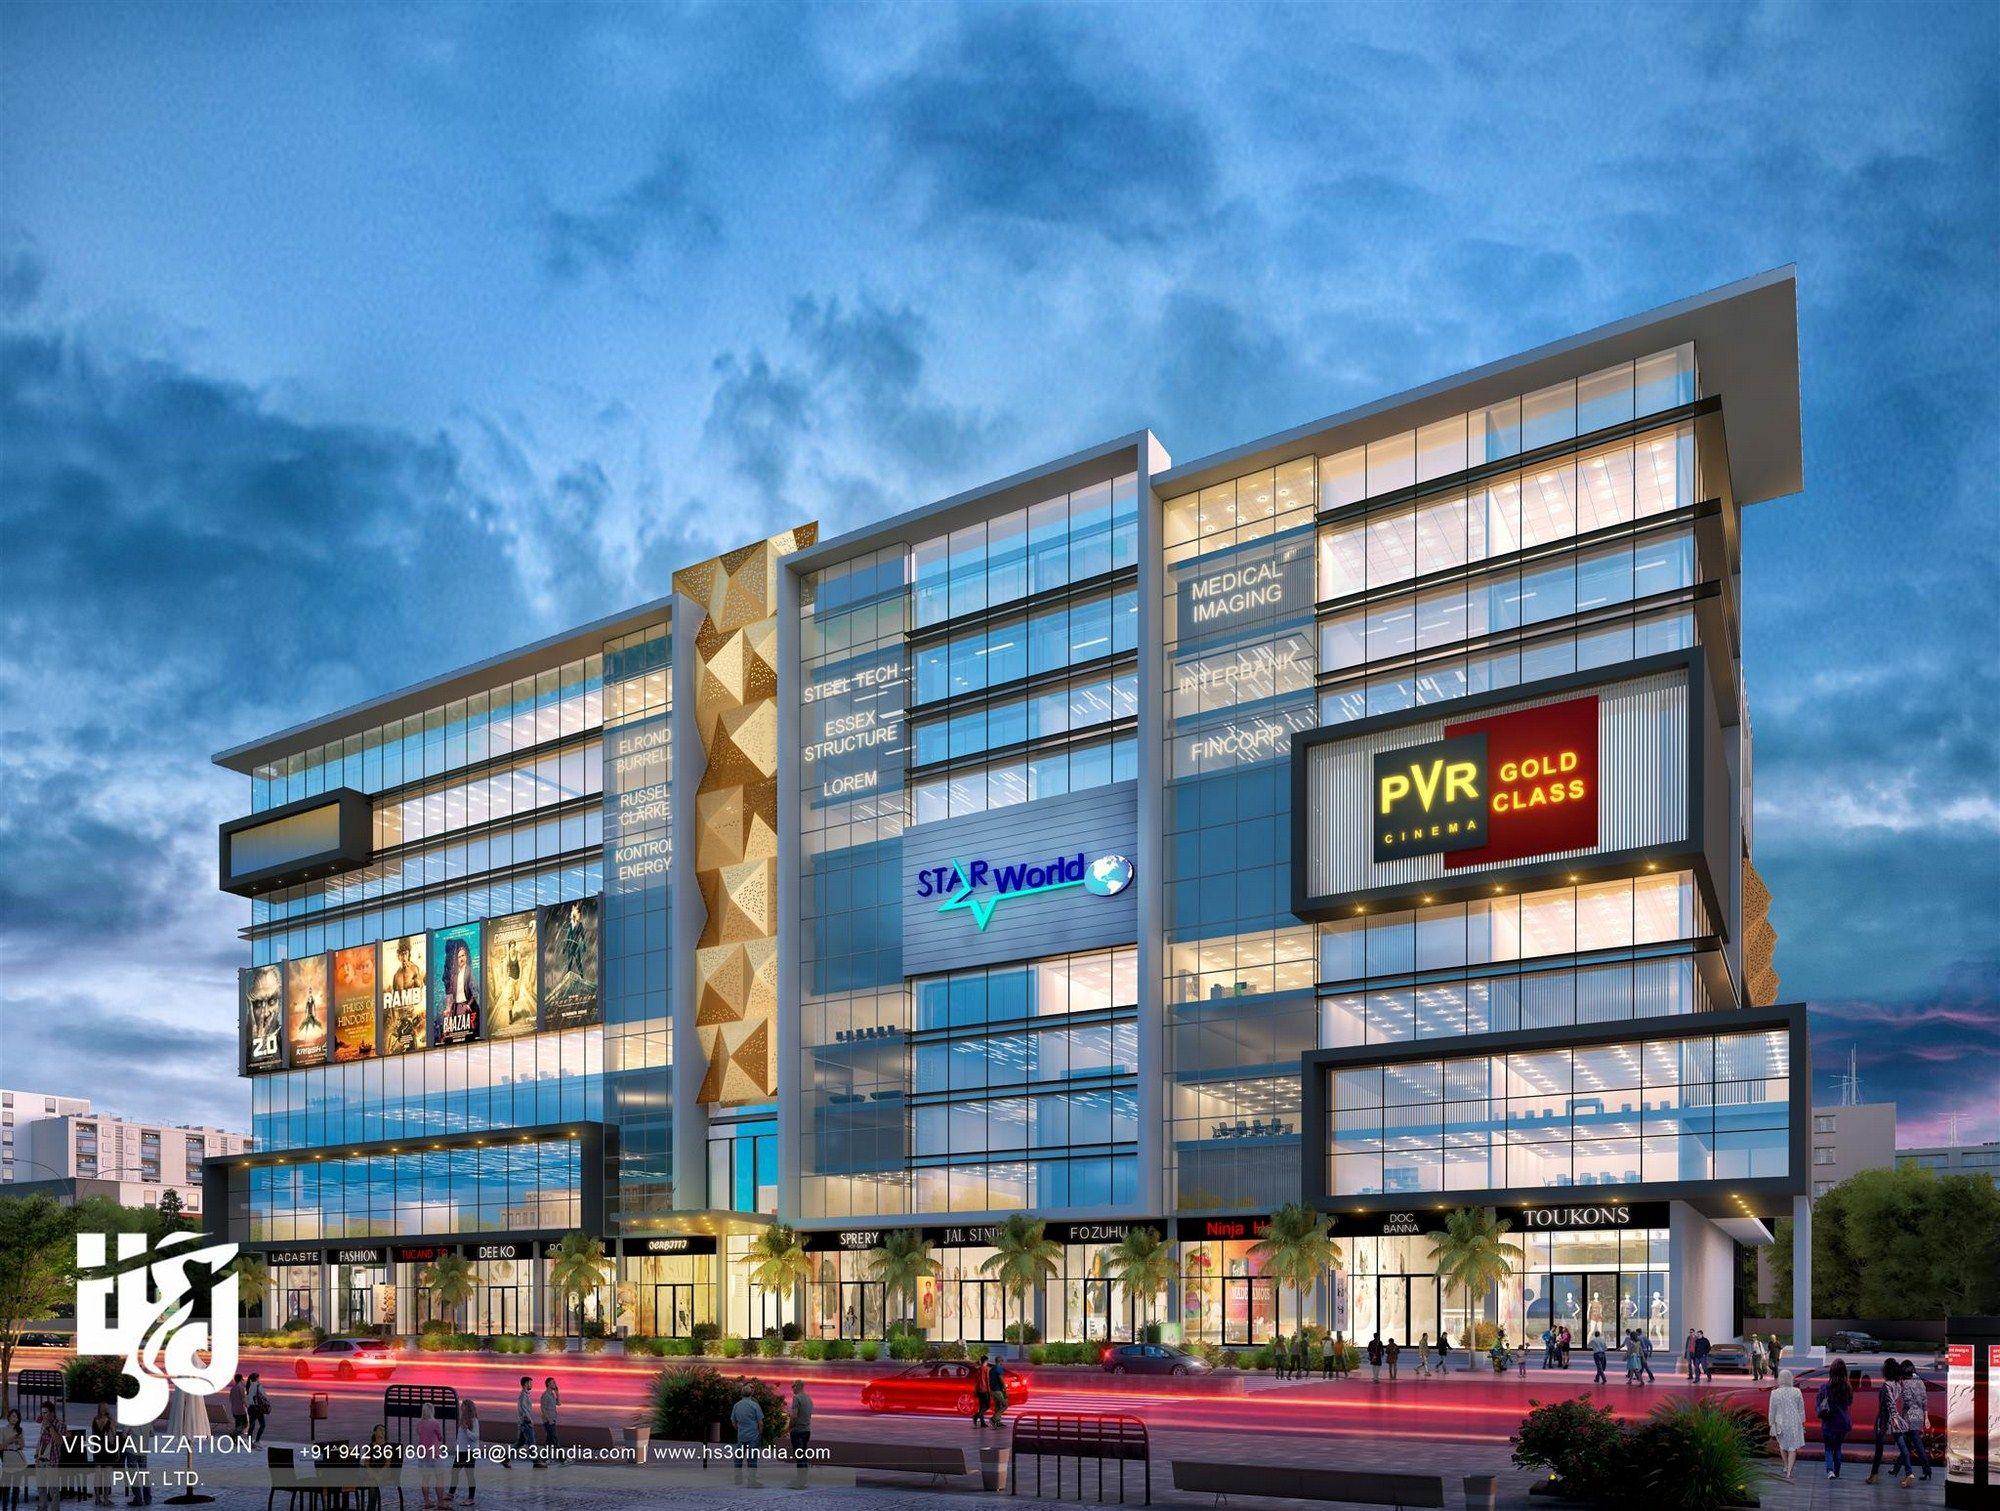 Modern Commercial Design Photorealistic Cgi Visualization Mall Facade Facade Design Shopping Mall Architecture